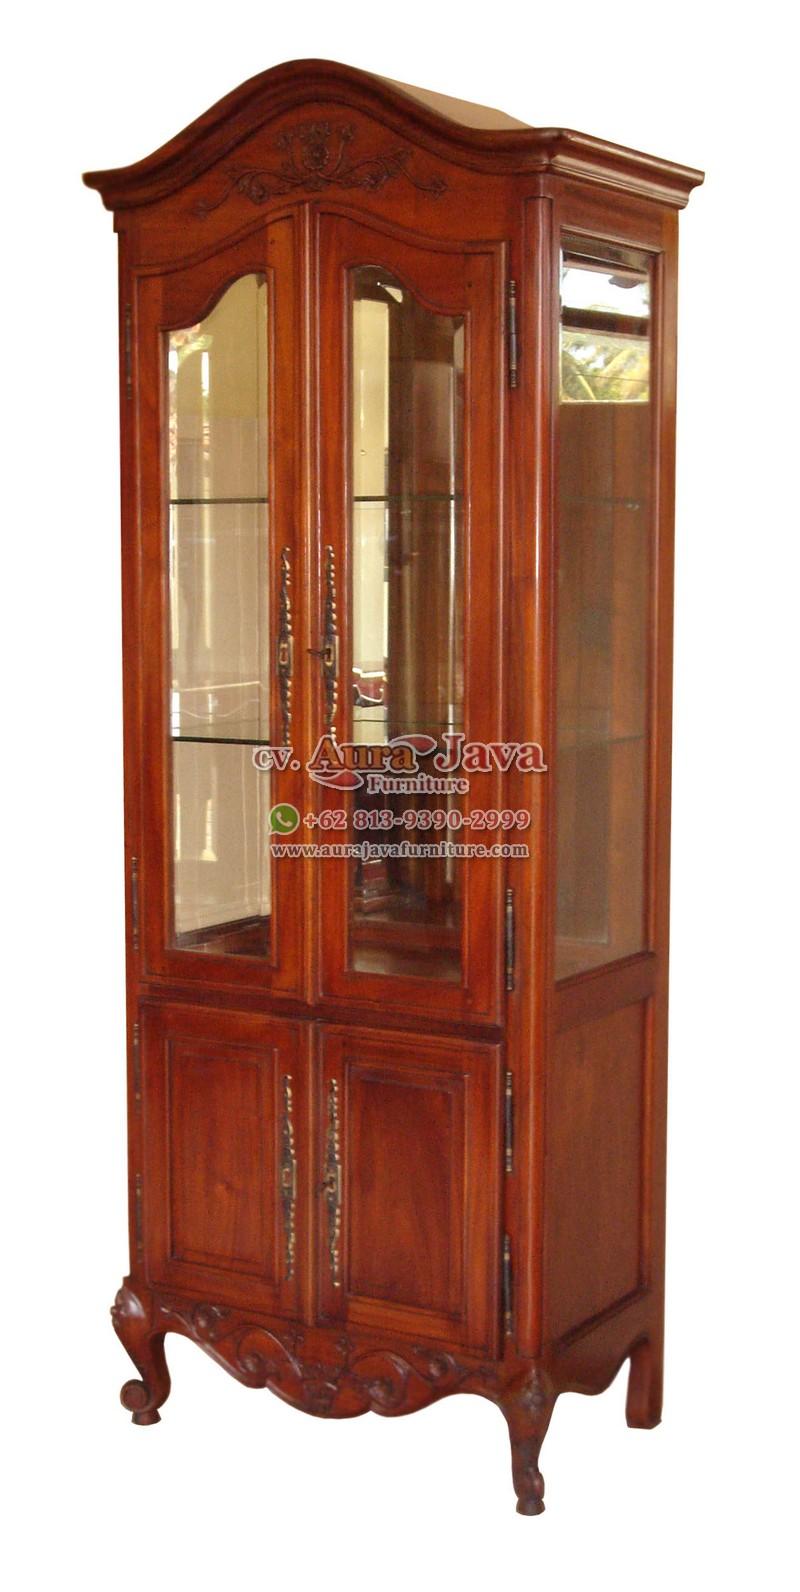 indonesia-mahogany-furniture-store-catalogue-book-case-aura-java-jepara_082